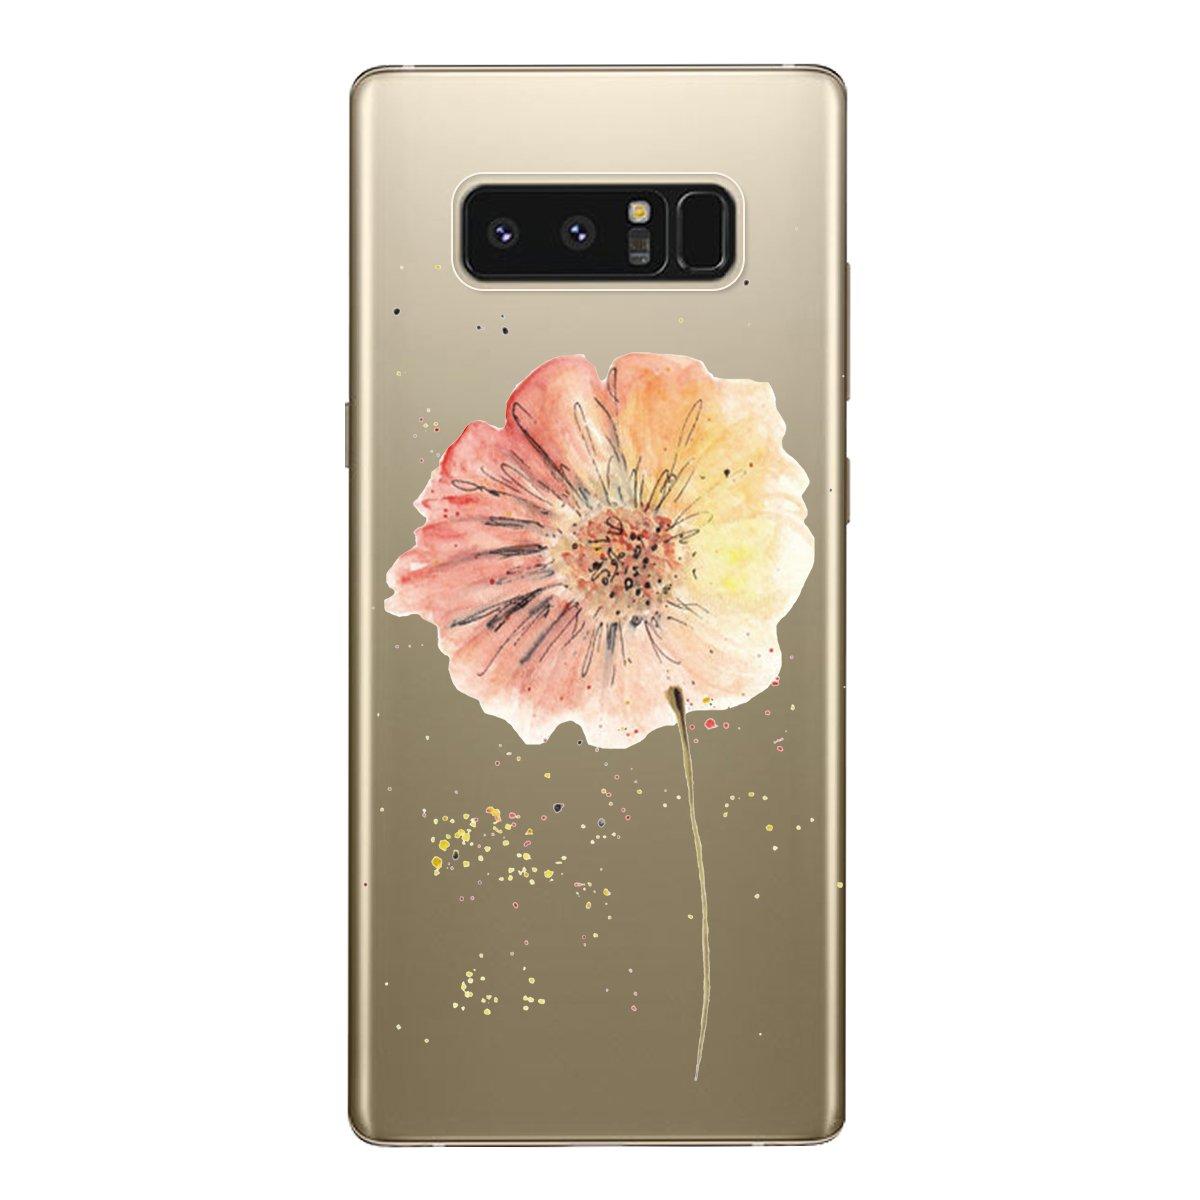 f/ür Samsung Galaxy S8 H/ülle Transparent Silikon Handytasche Handyh/ülle Schutzh/ülle TPU Etui Bumper Ultra D/ünn Slim Durchsichtig Clear Case Cover 3 Packs Rose Rot Grau Yokata Blau